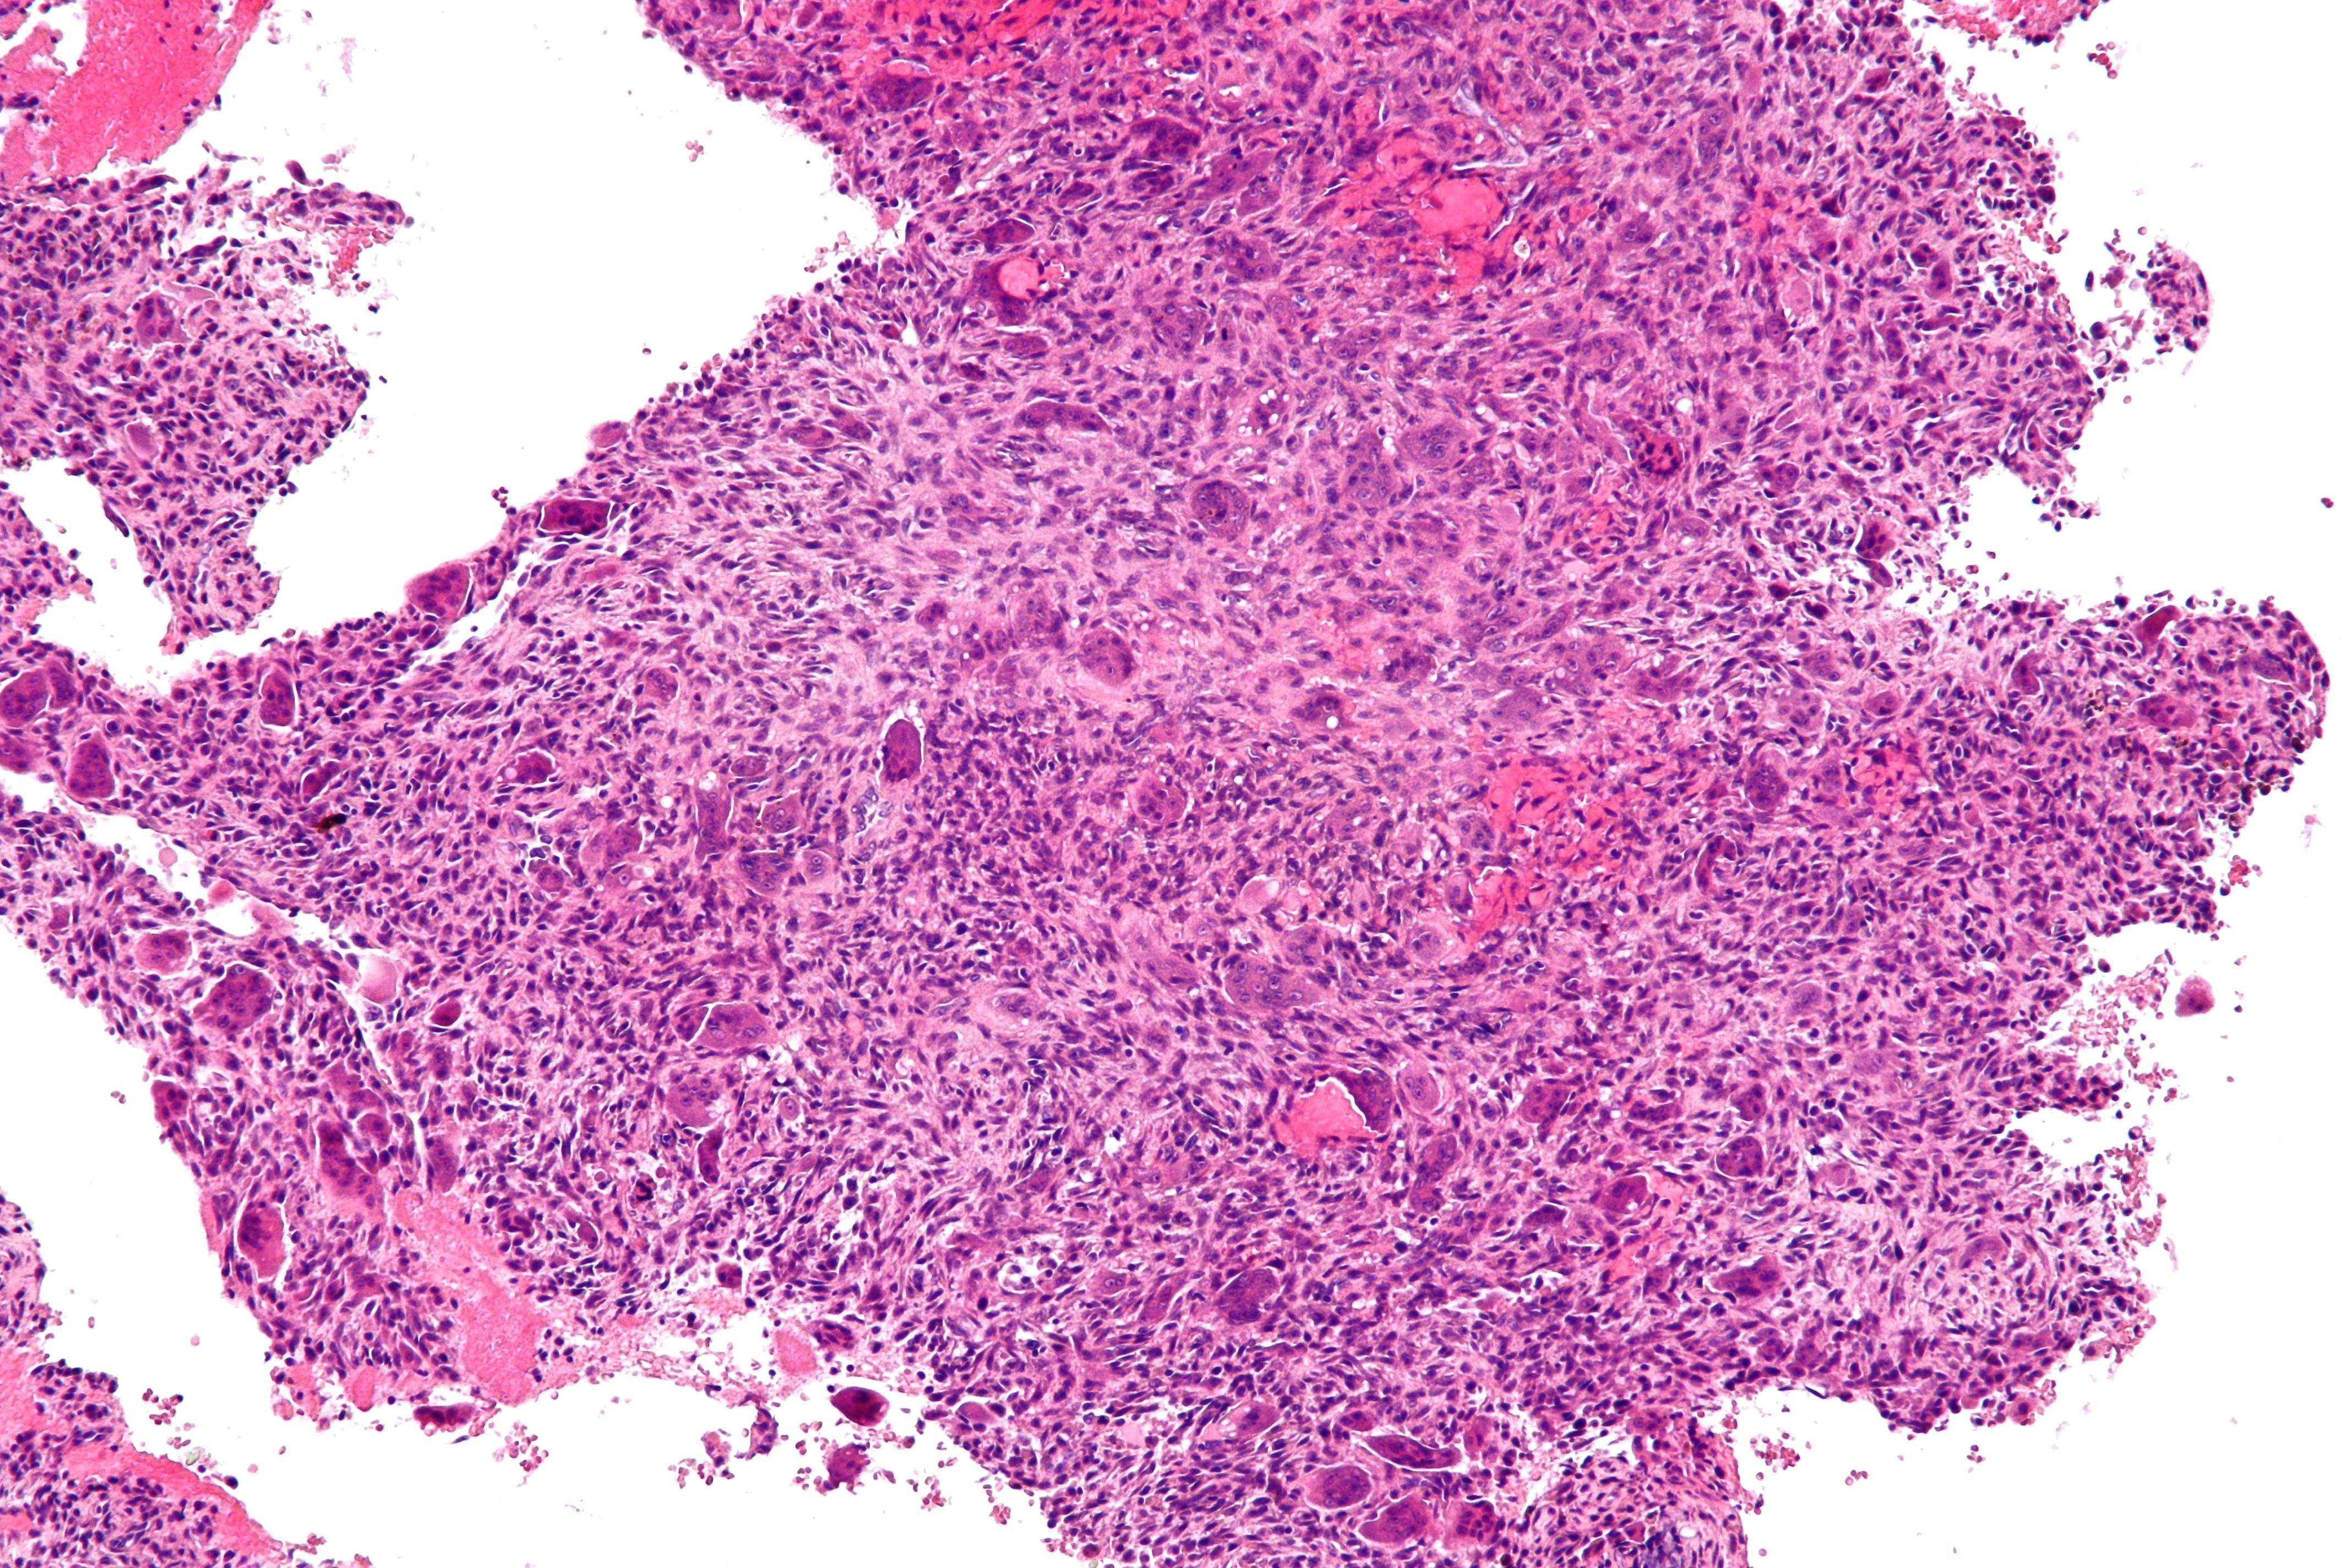 File:Aneurysmal bone cyst - intermed mag.jpg